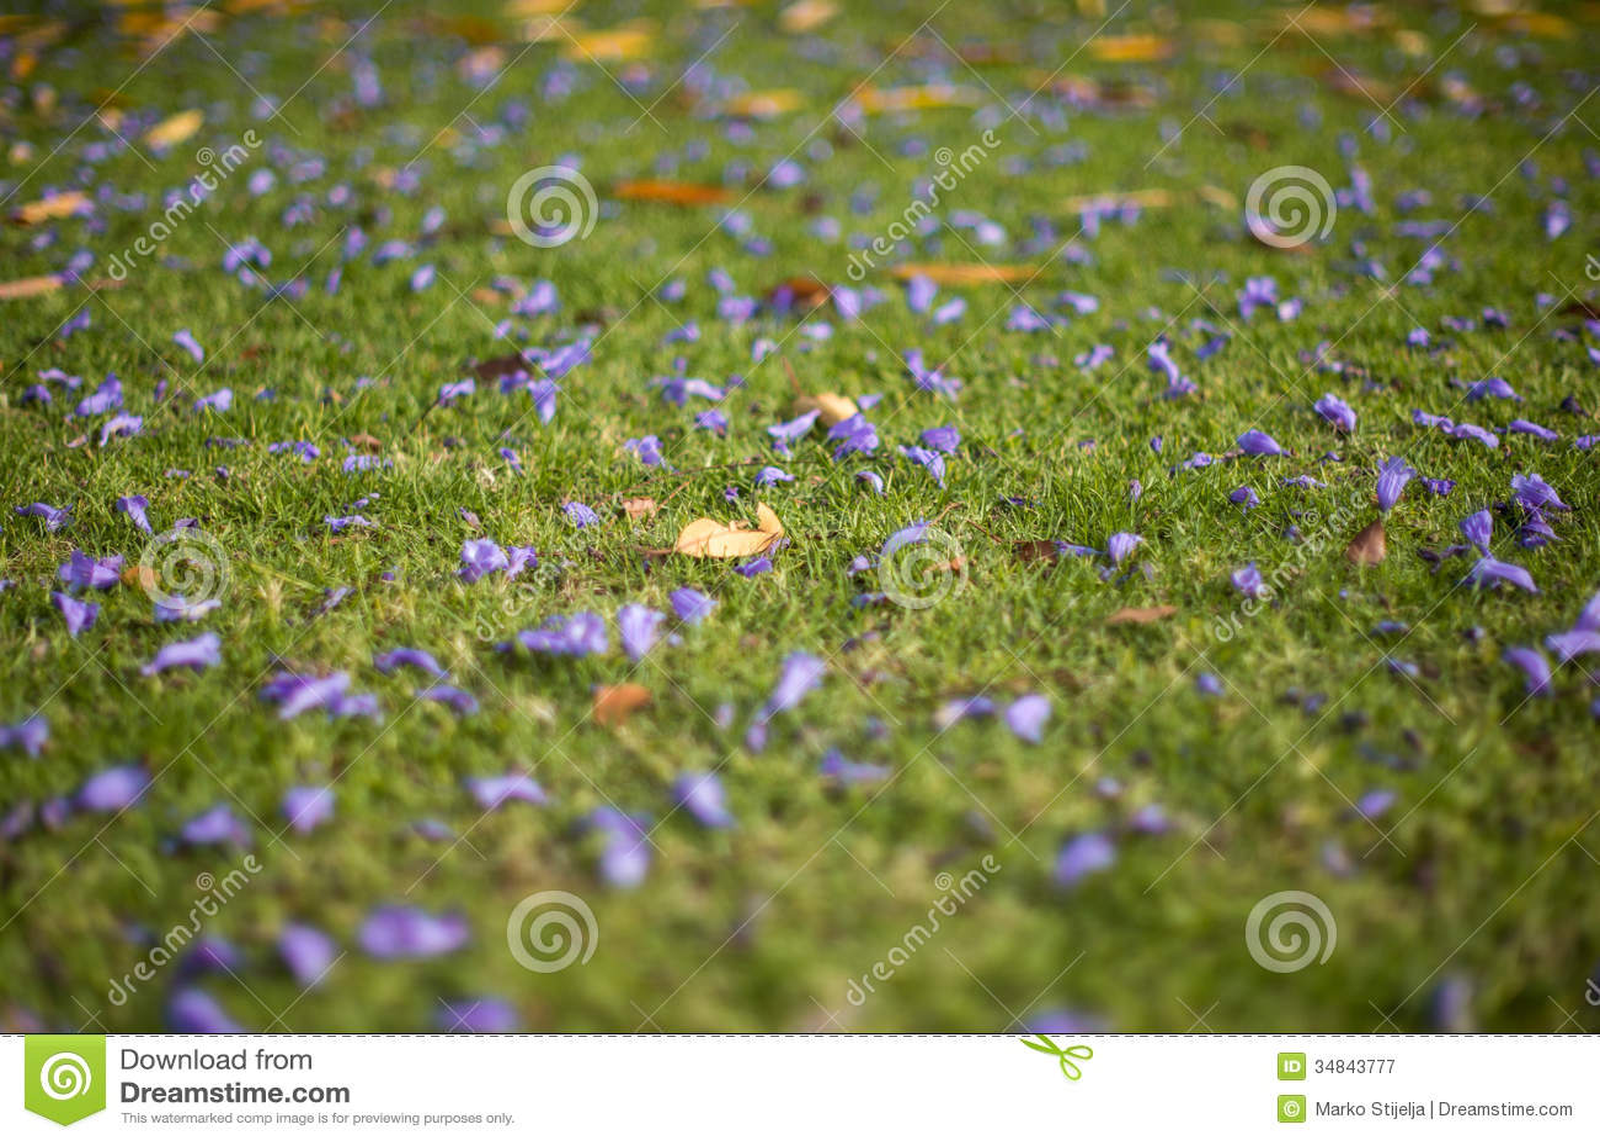 Jacquaranda-Blumen auf Rasenfläche